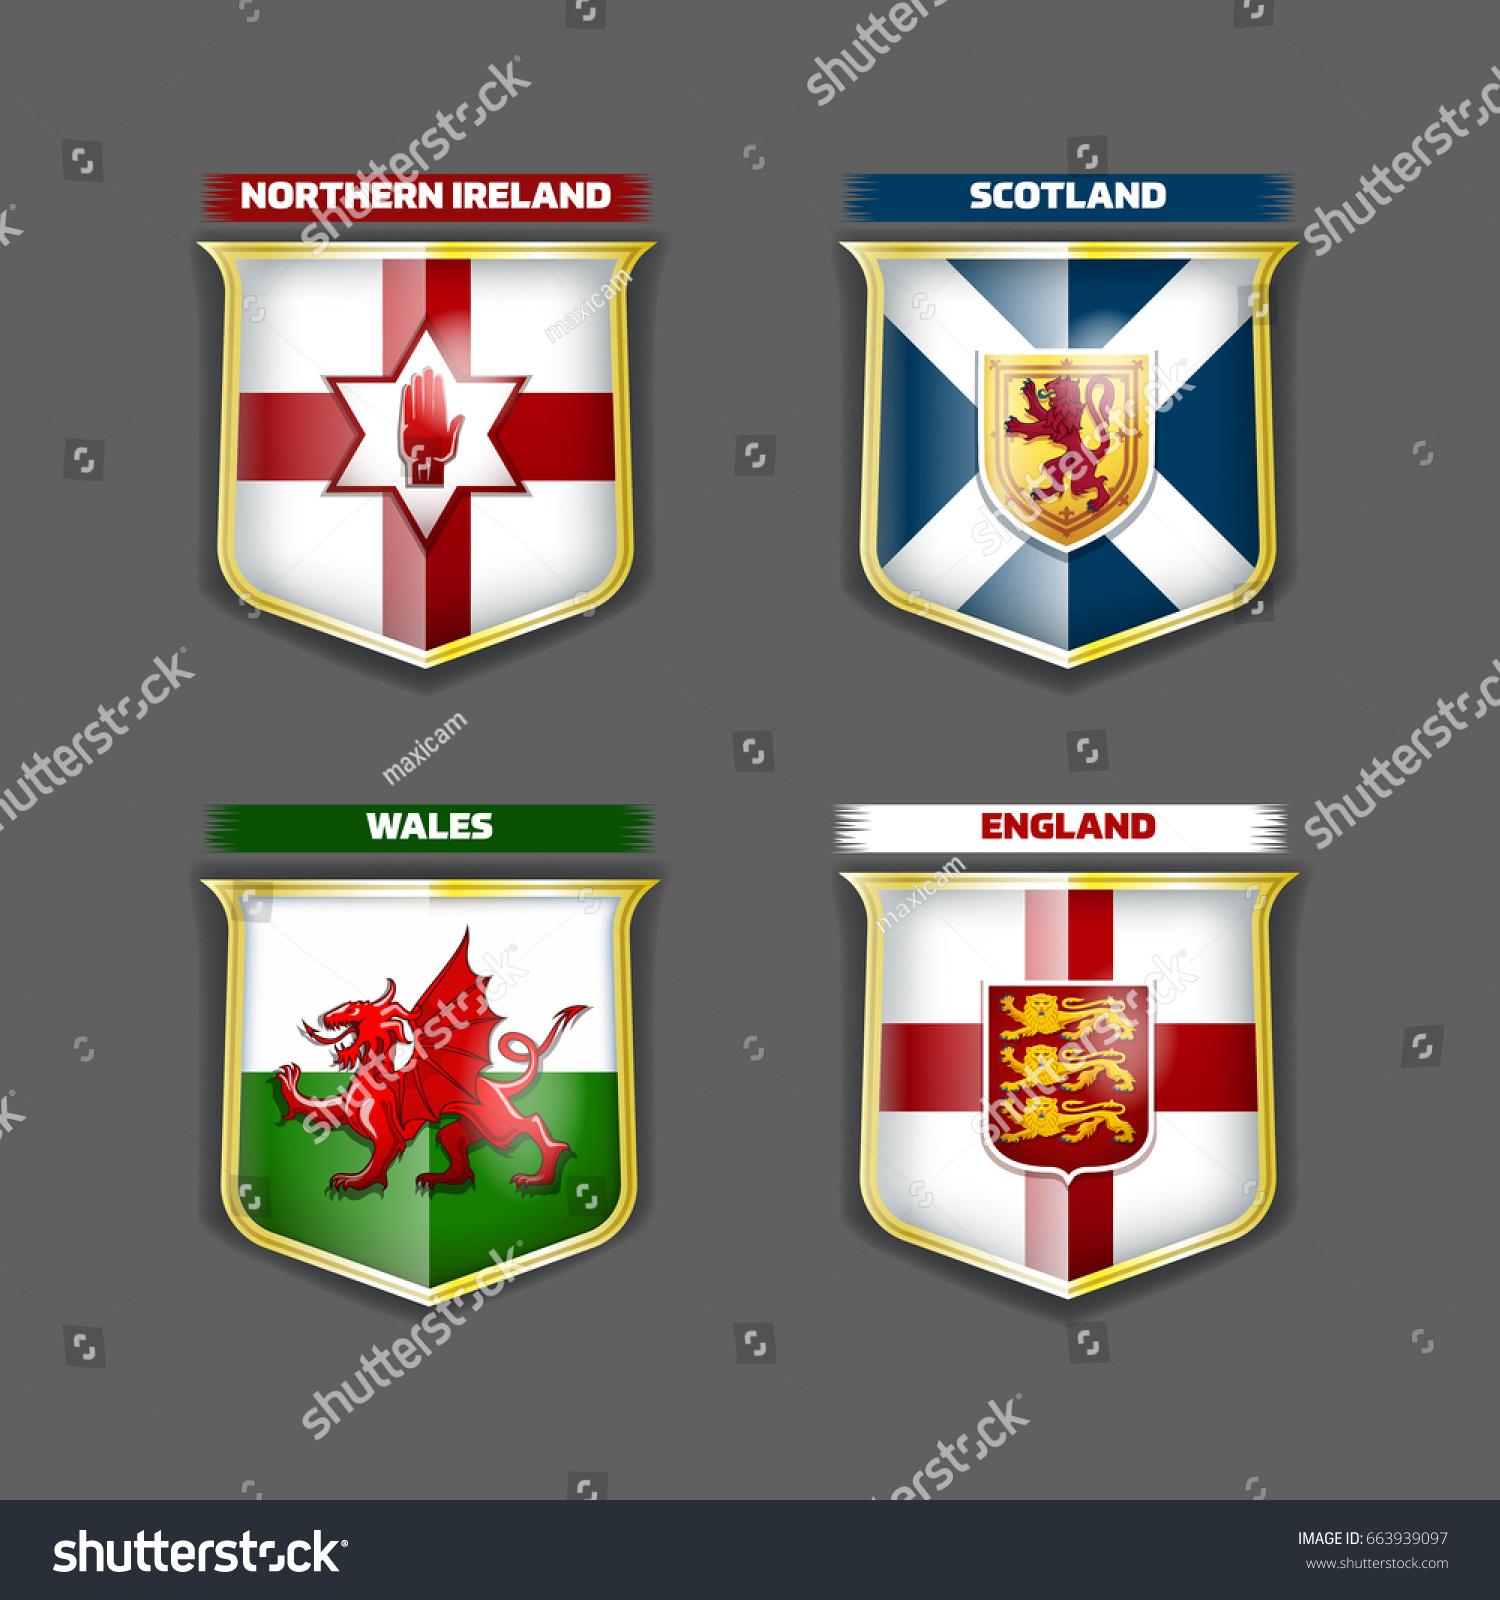 Vector flags coats arms england scotland stock vector 663939097 vector flags and coats of arms of england scotland wales northern ireland on the shields buycottarizona